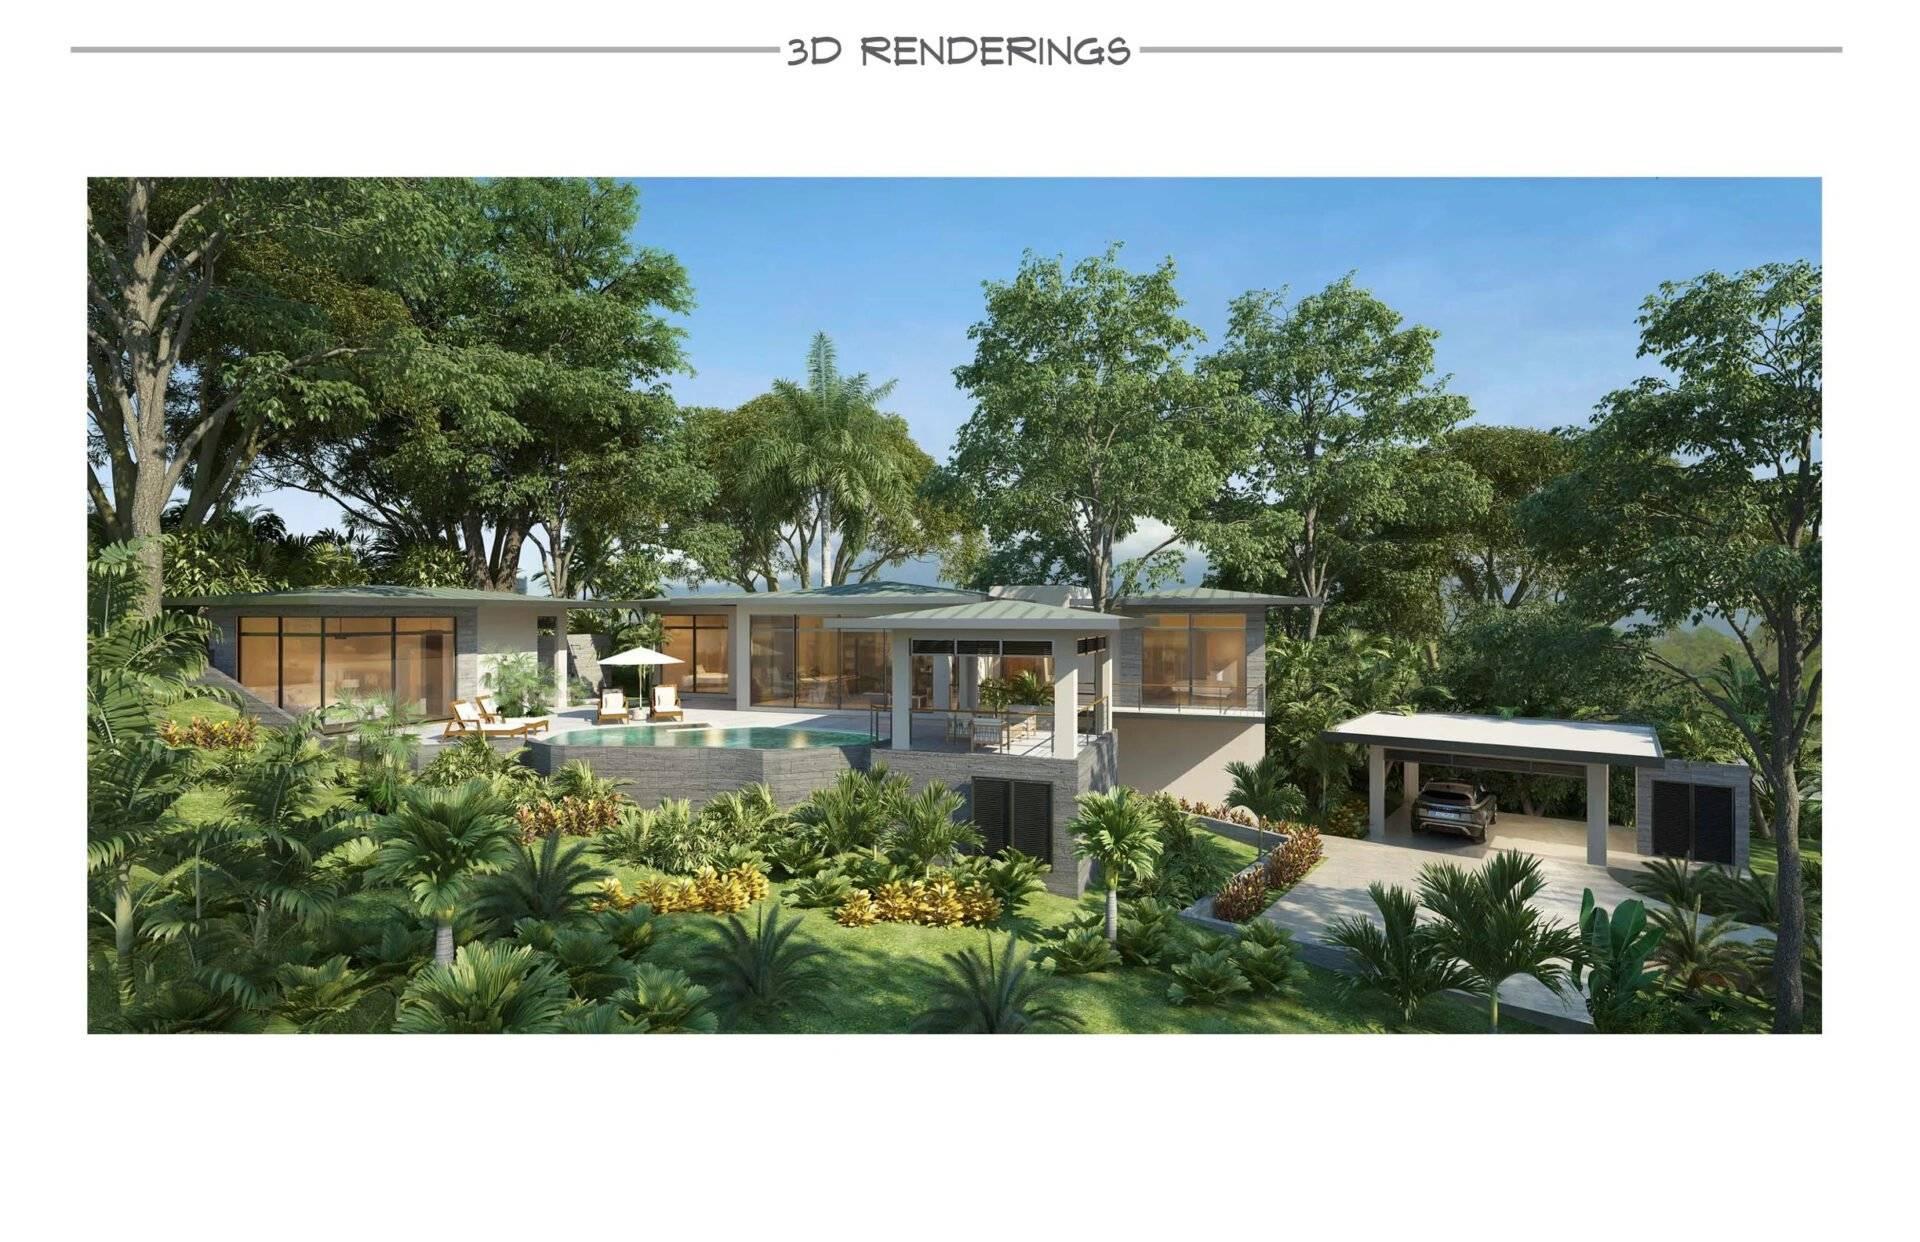 Senderos 1D Modern Luxury Home *UNDER CONTRACT*